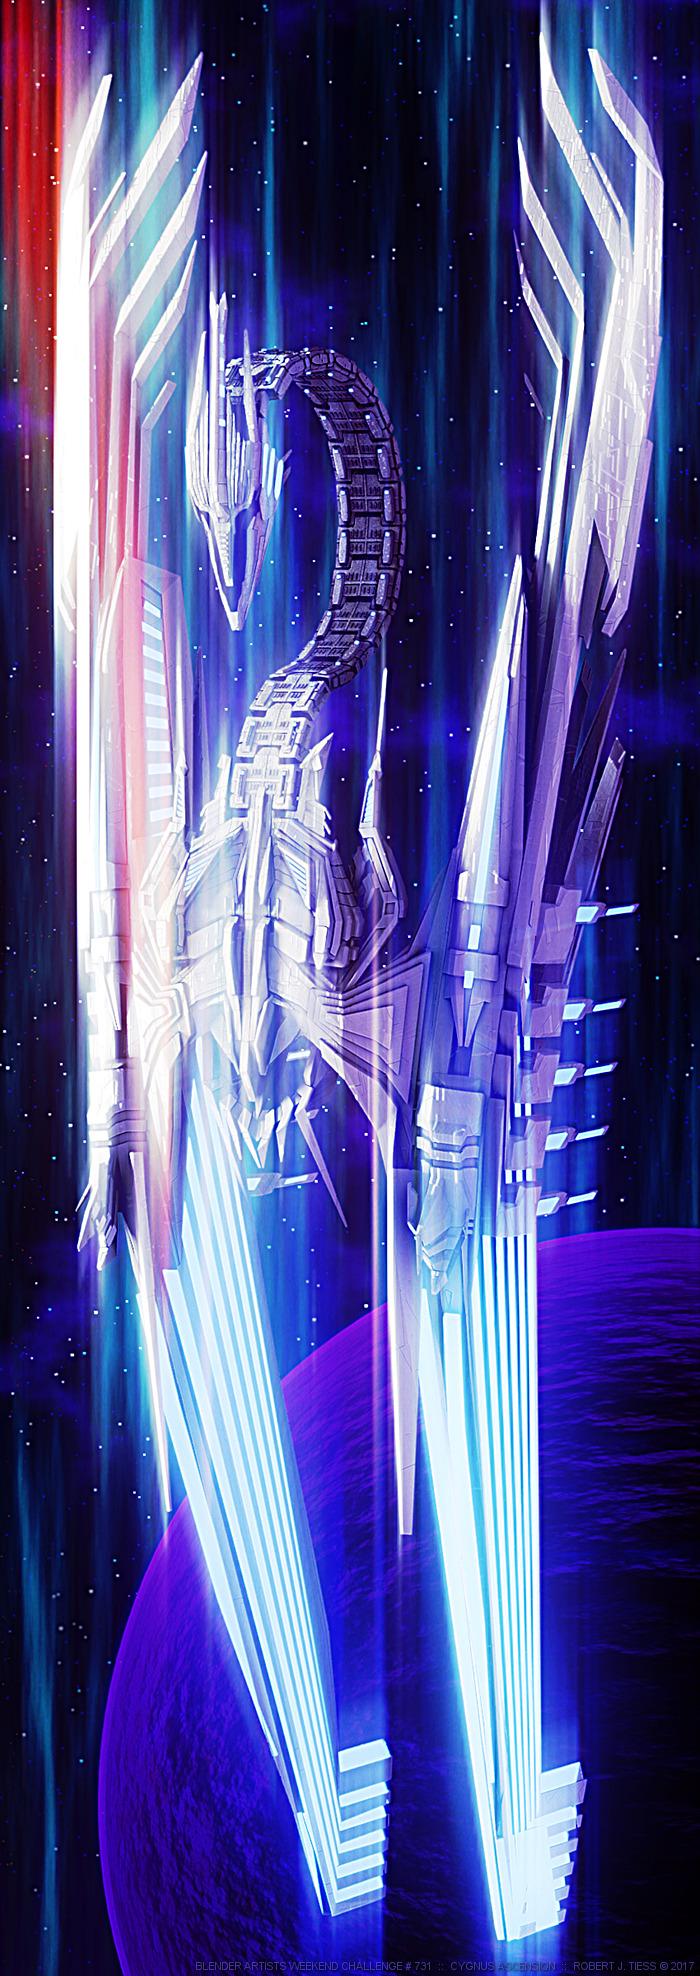 Cygnus Ascension - By Robert J. Tiess